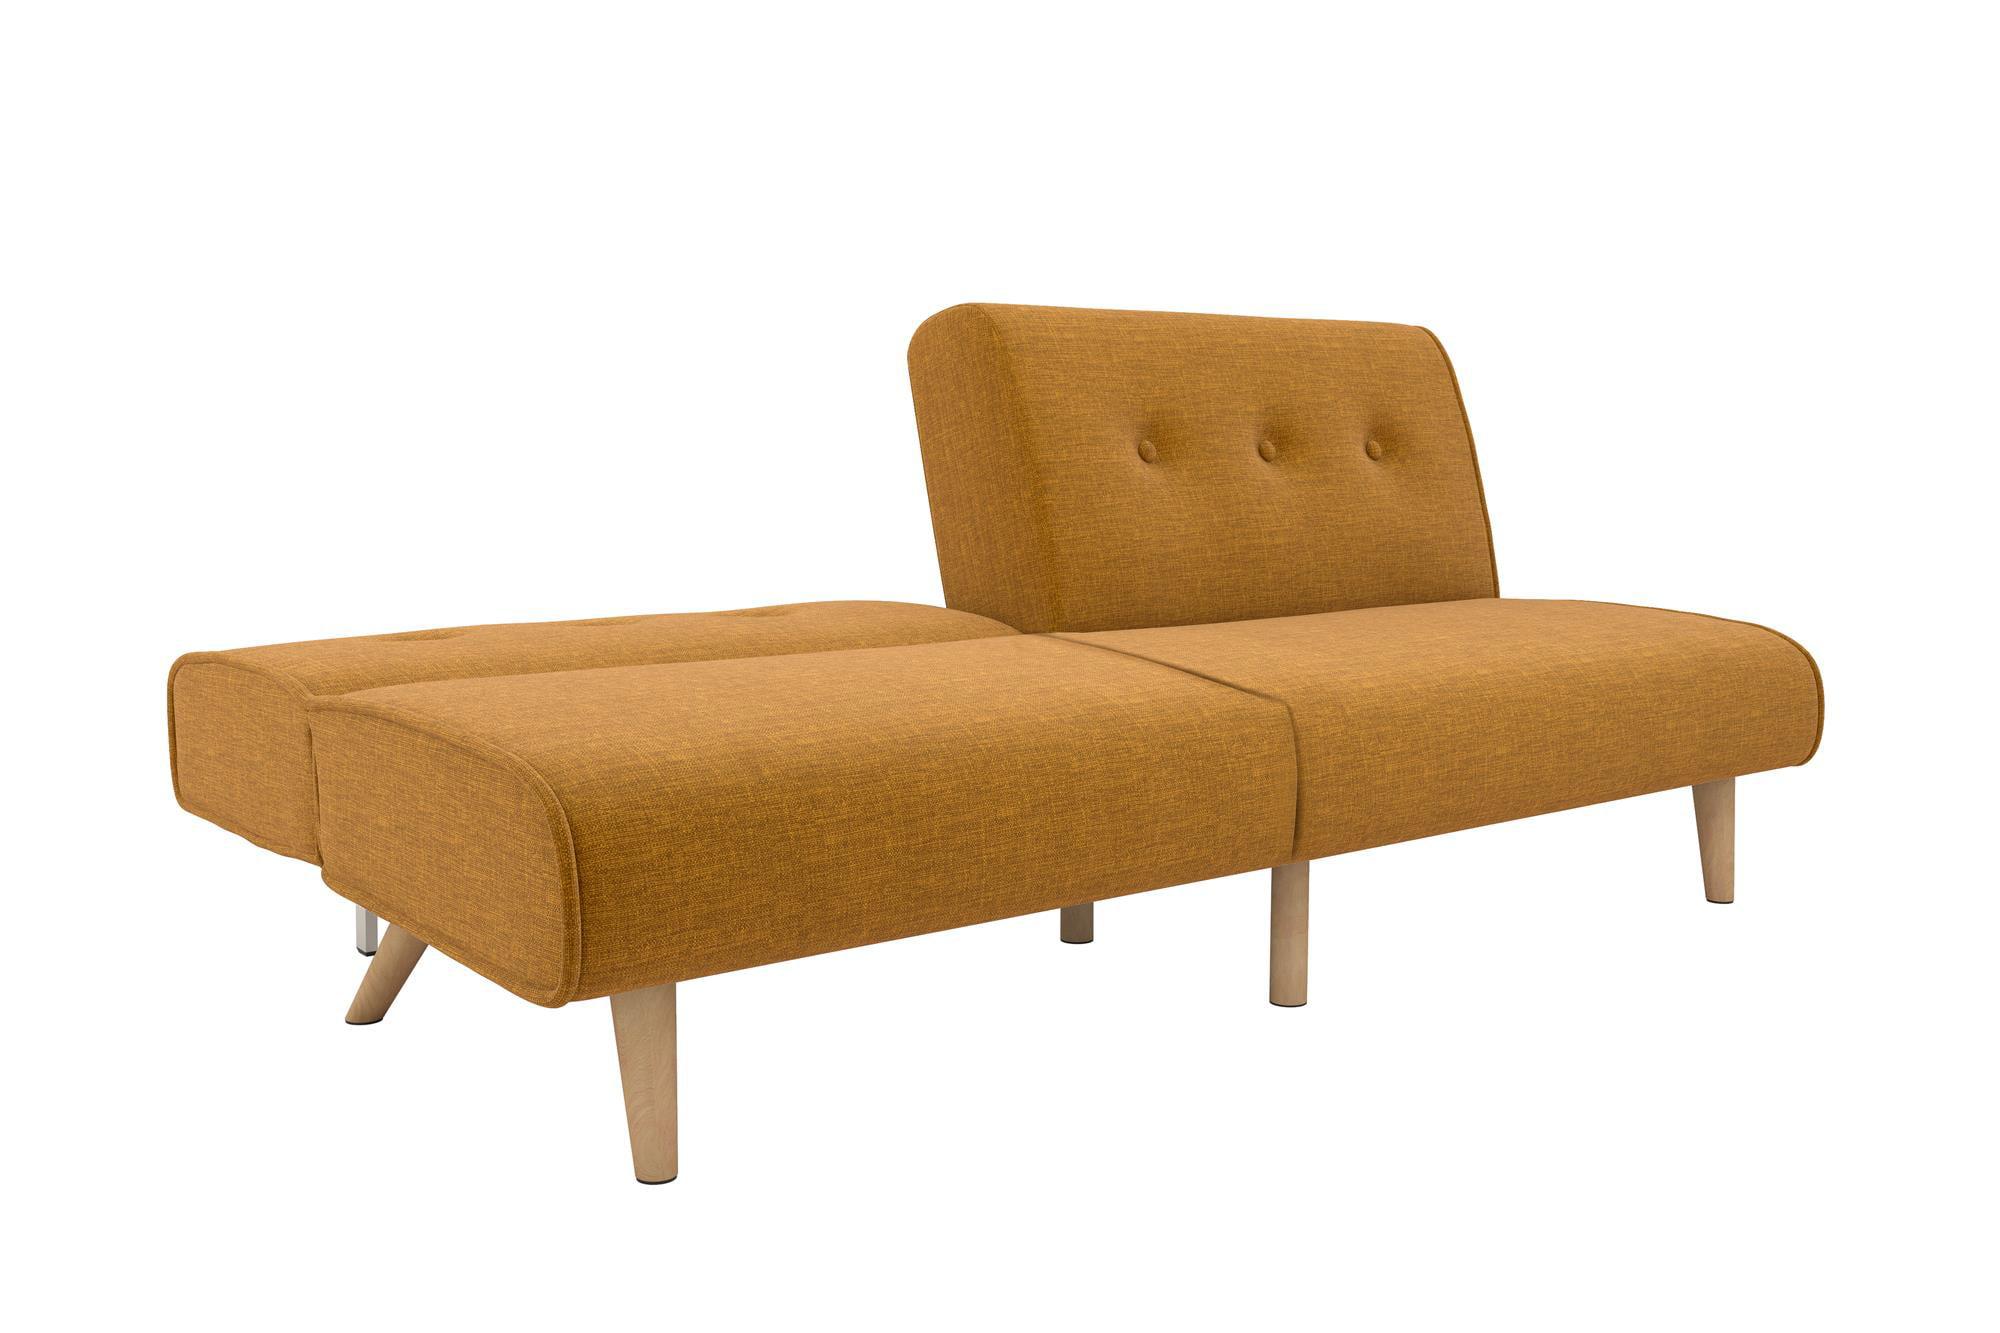 Split Futon Sofa Sleeper Couch Longer Upholstery Living Room Studio Guest Yellow